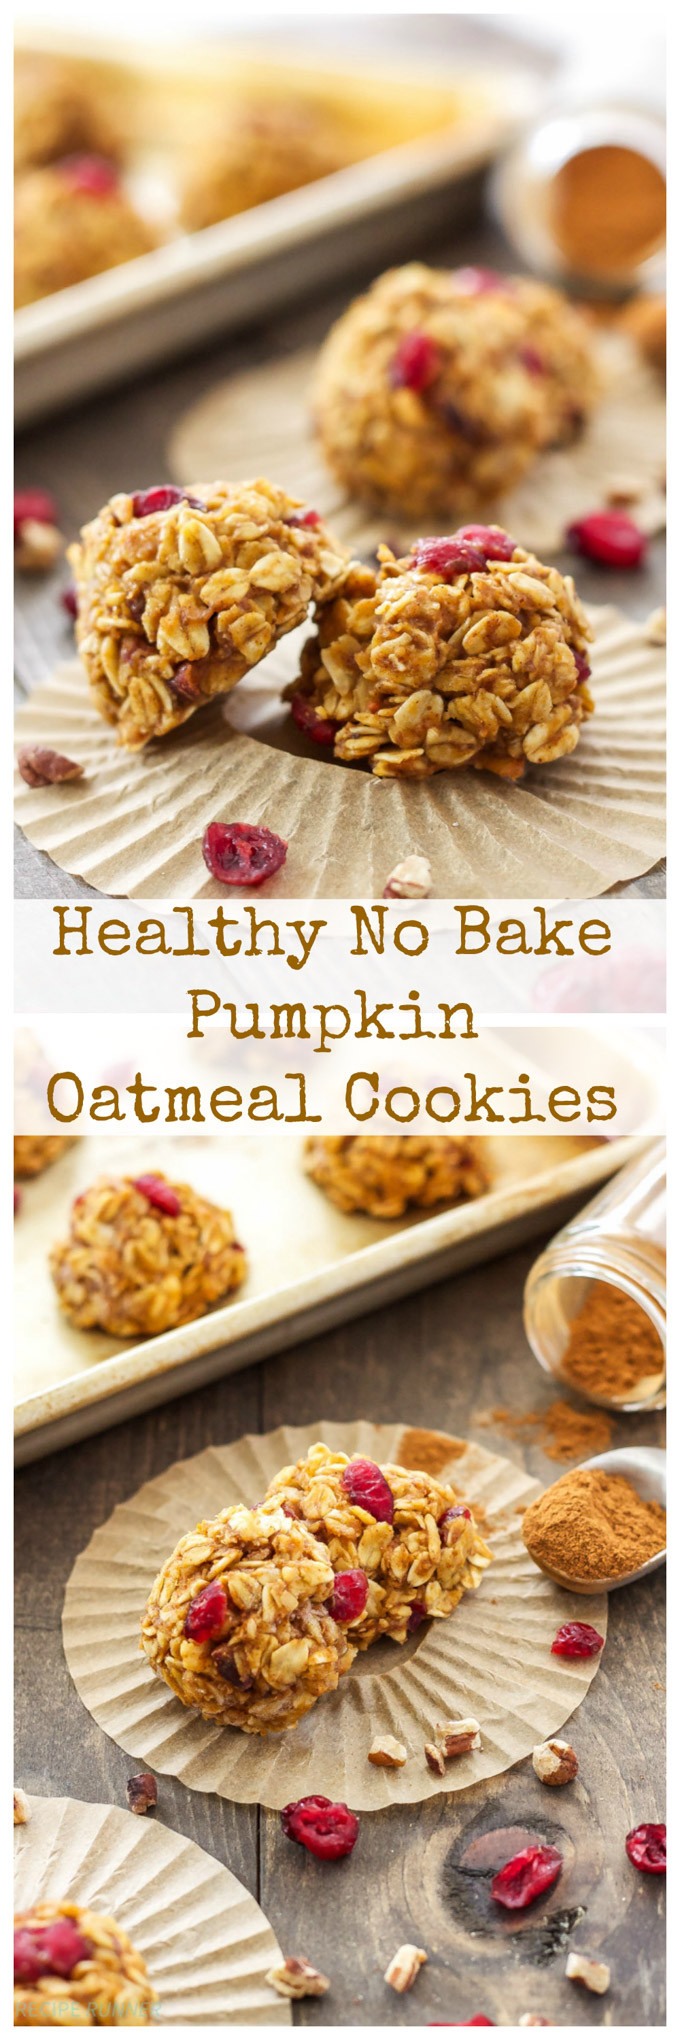 No Bake Oatmeal Cookies Healthy  Healthy No Bake Pumpkin Cookies Recipe Runner